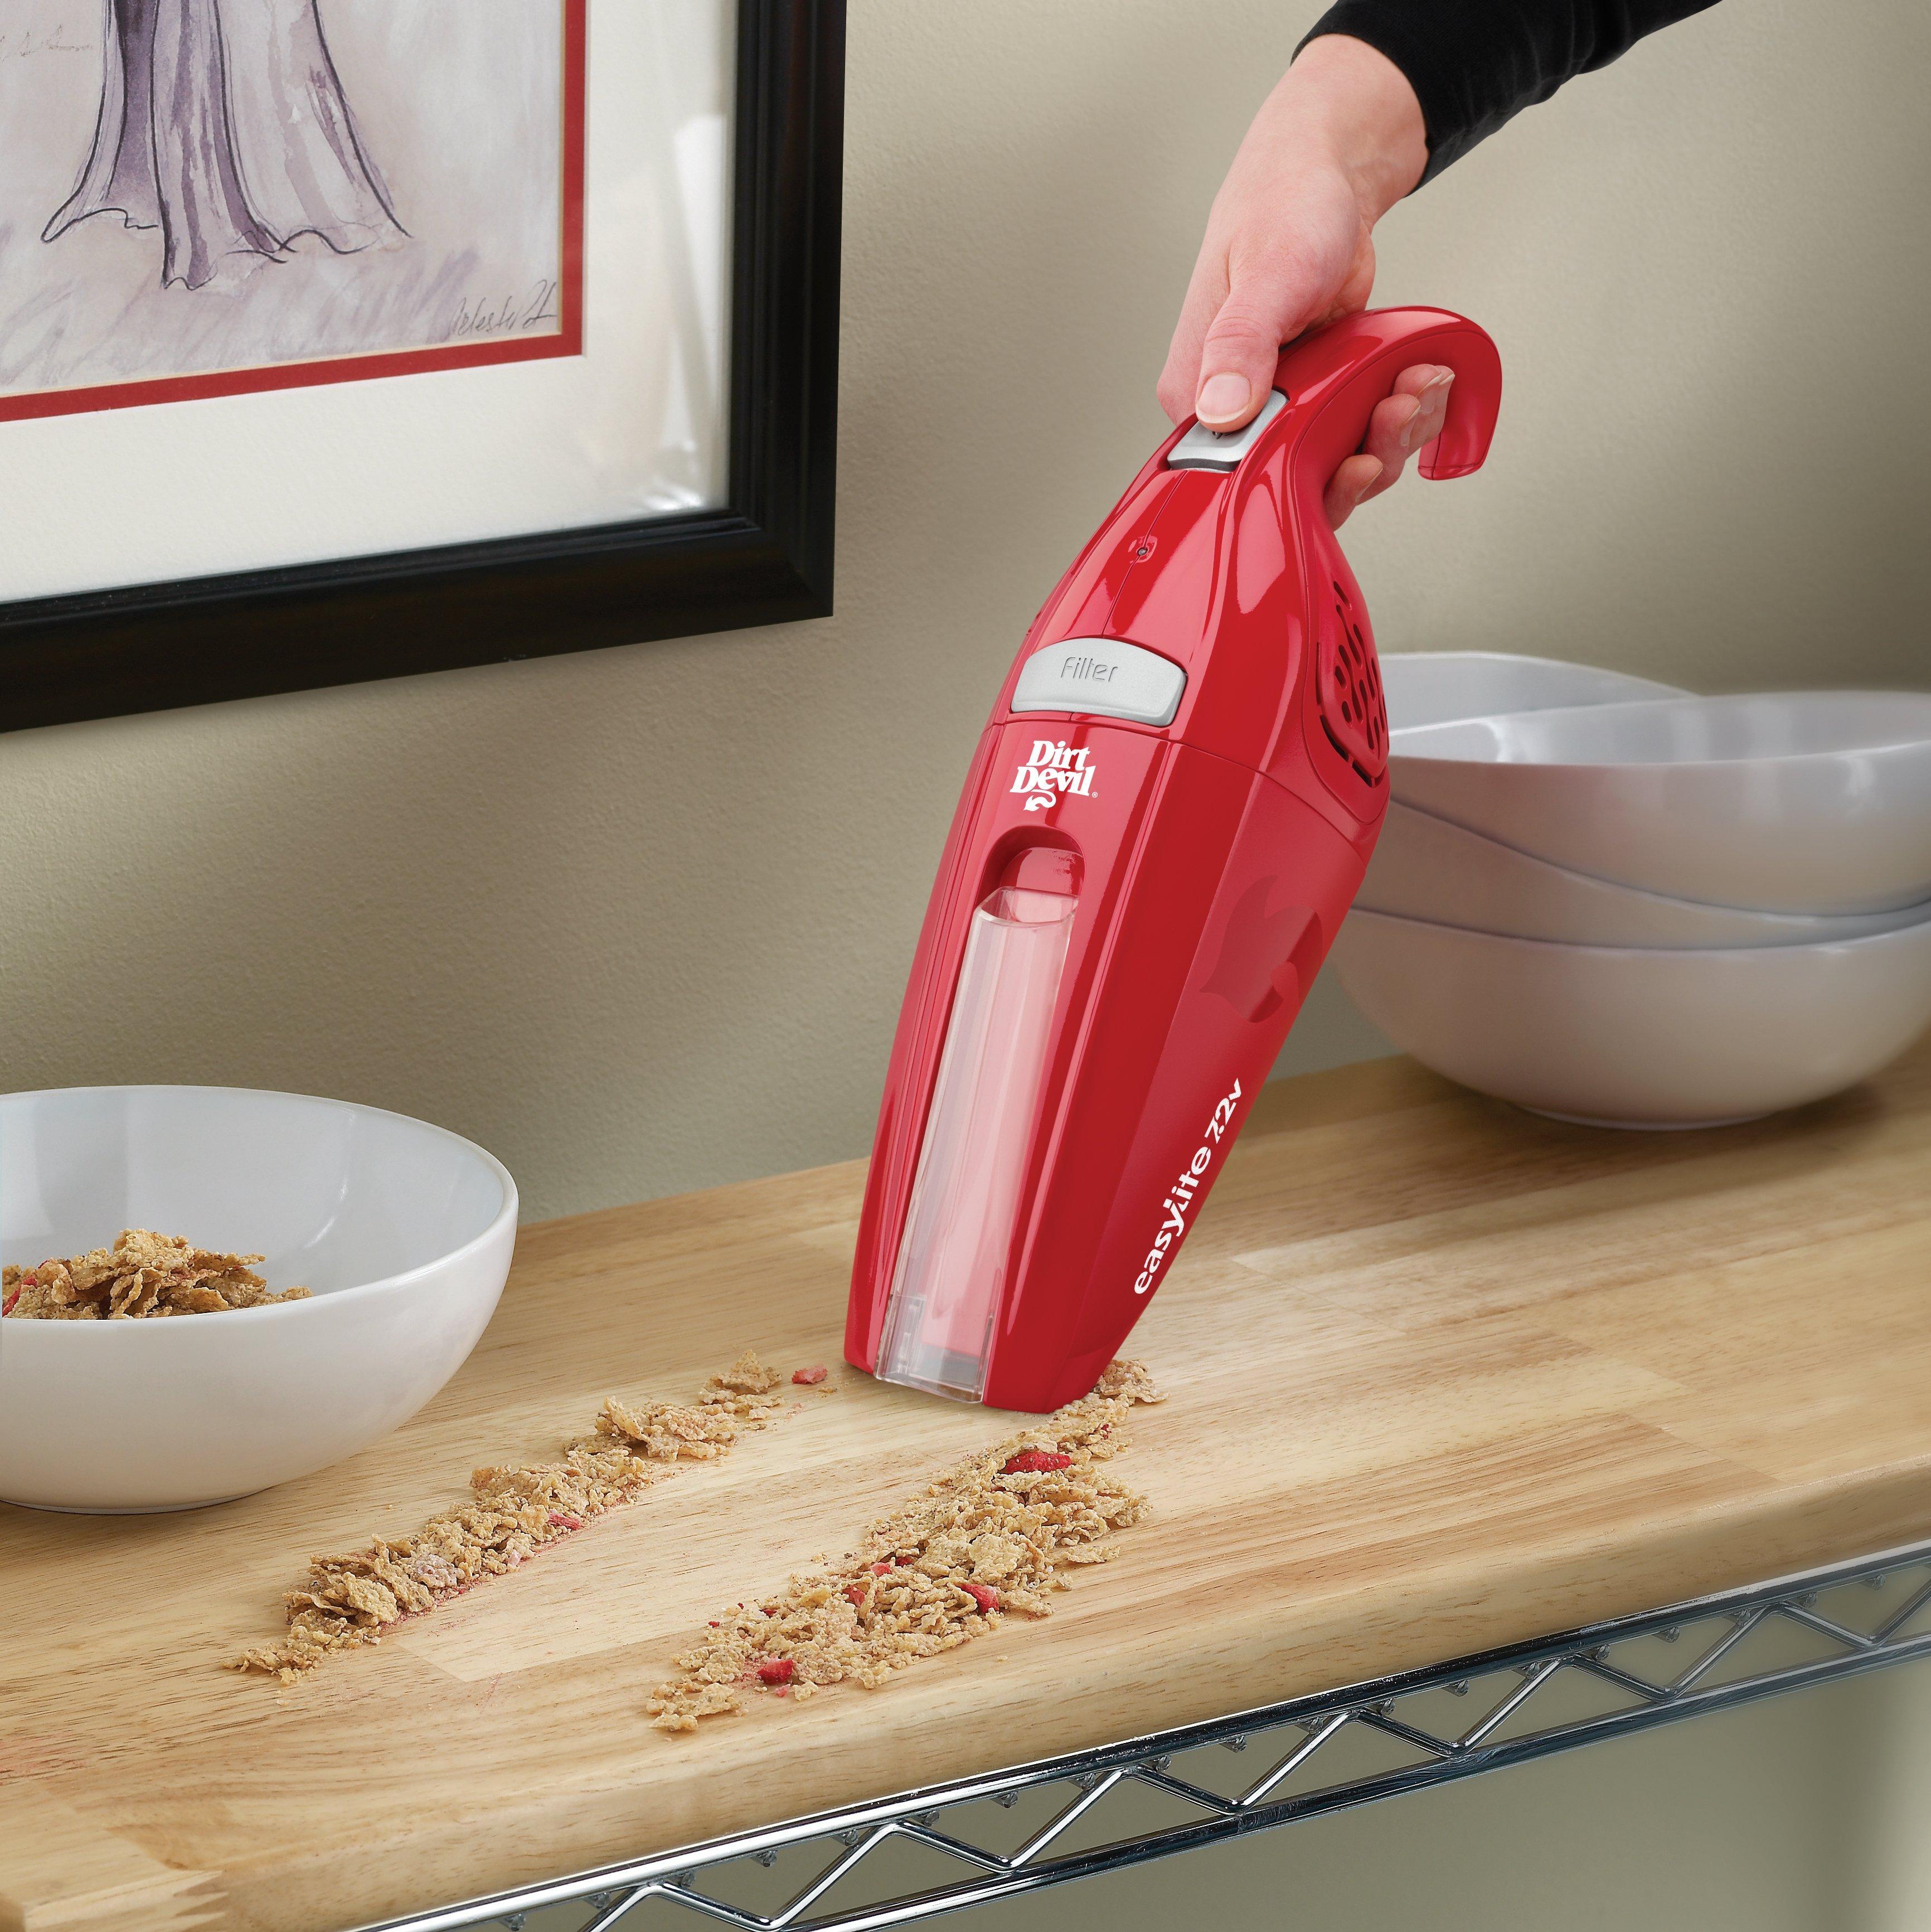 Easy Lite 7.2V Cordless Hand Vacuum3